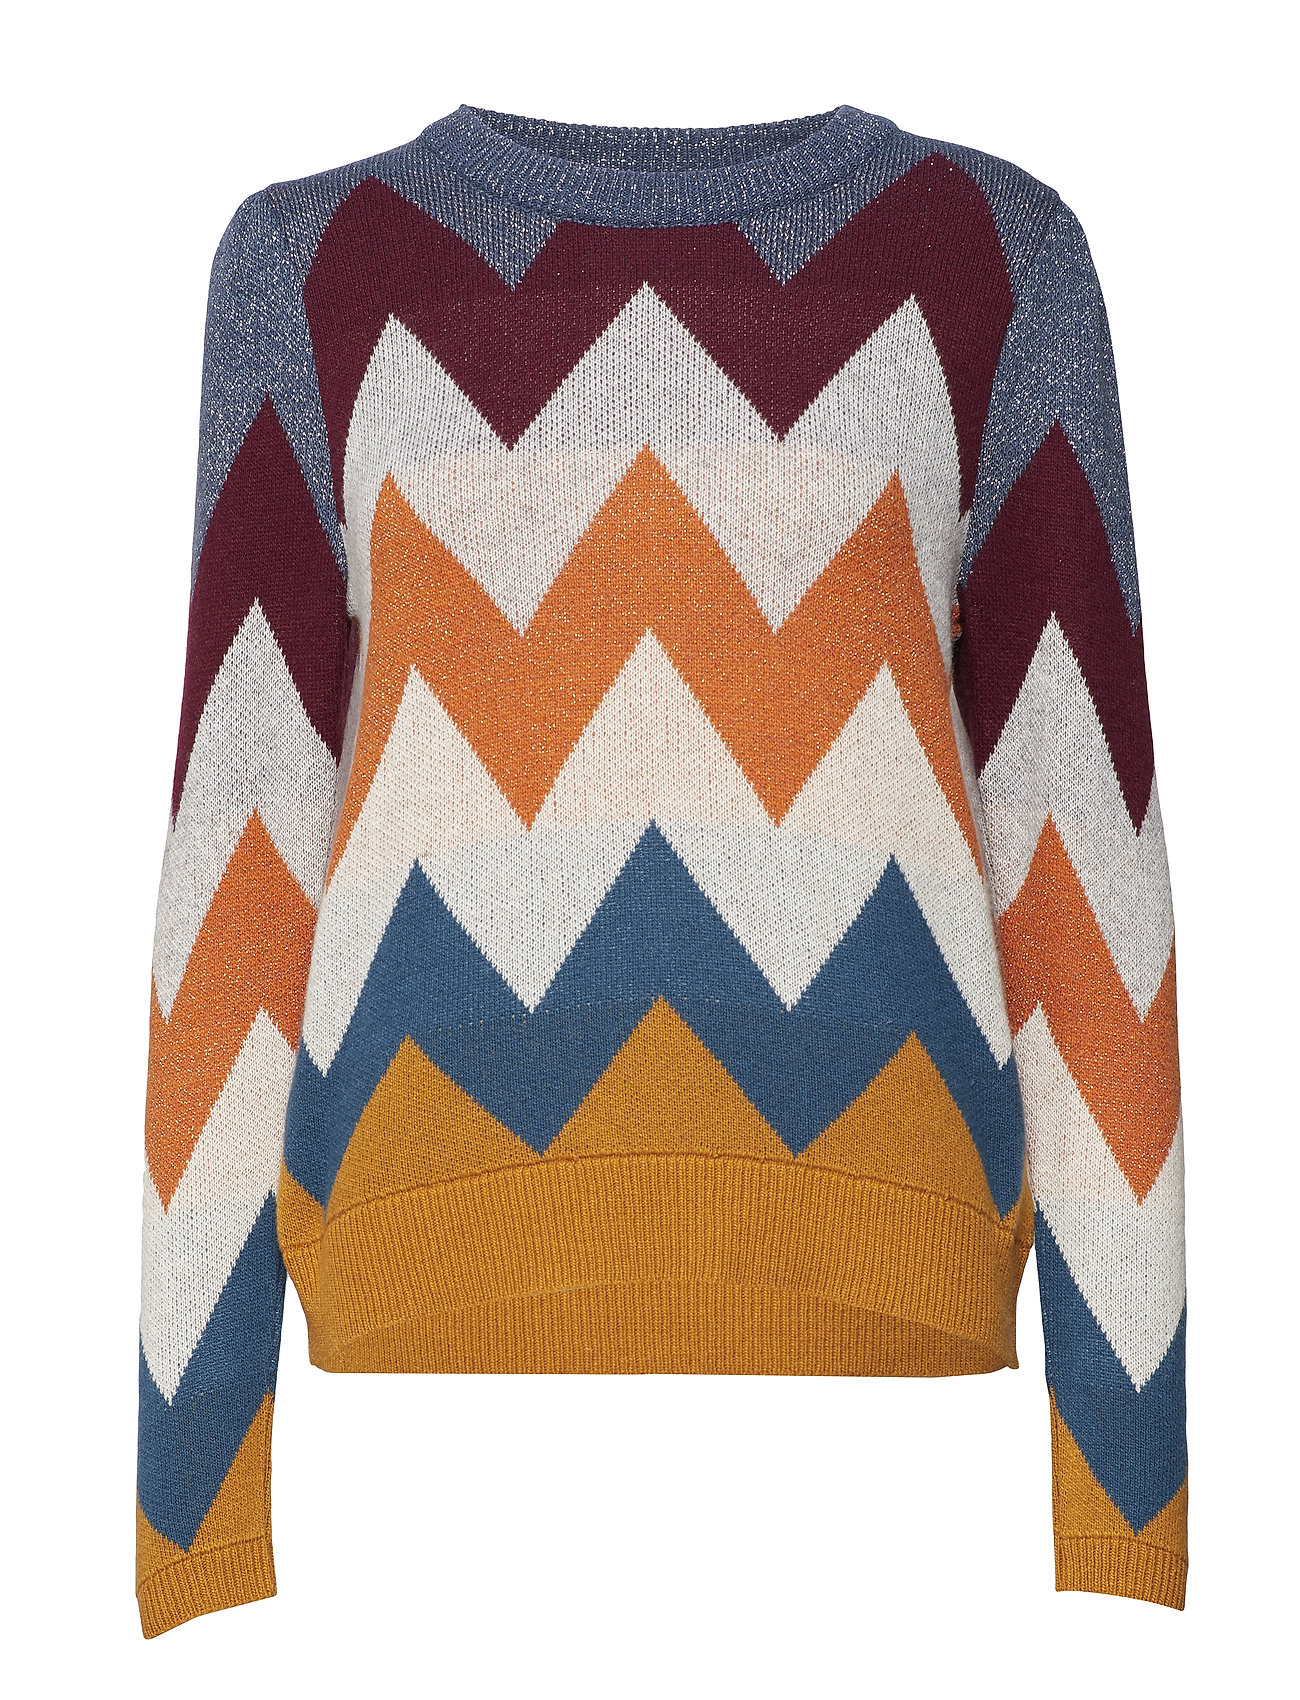 63f075185d386 Lea Knit (Multi Colour) (101.49 €) - Birgitte Herskind - | Boozt.com